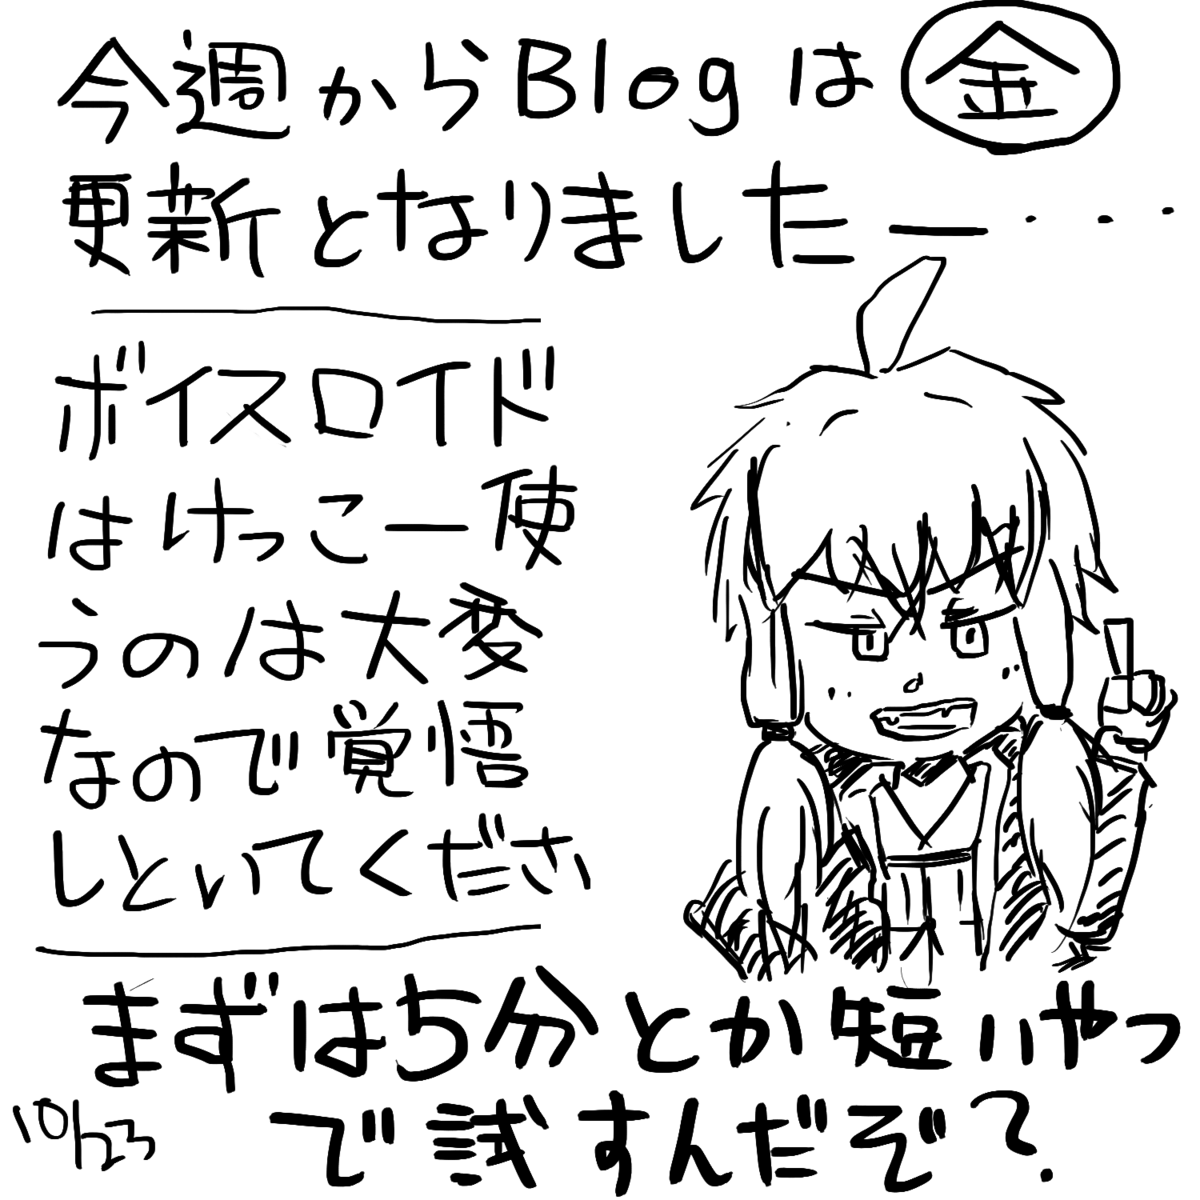 f:id:zomuzomu:20201023120710p:plain